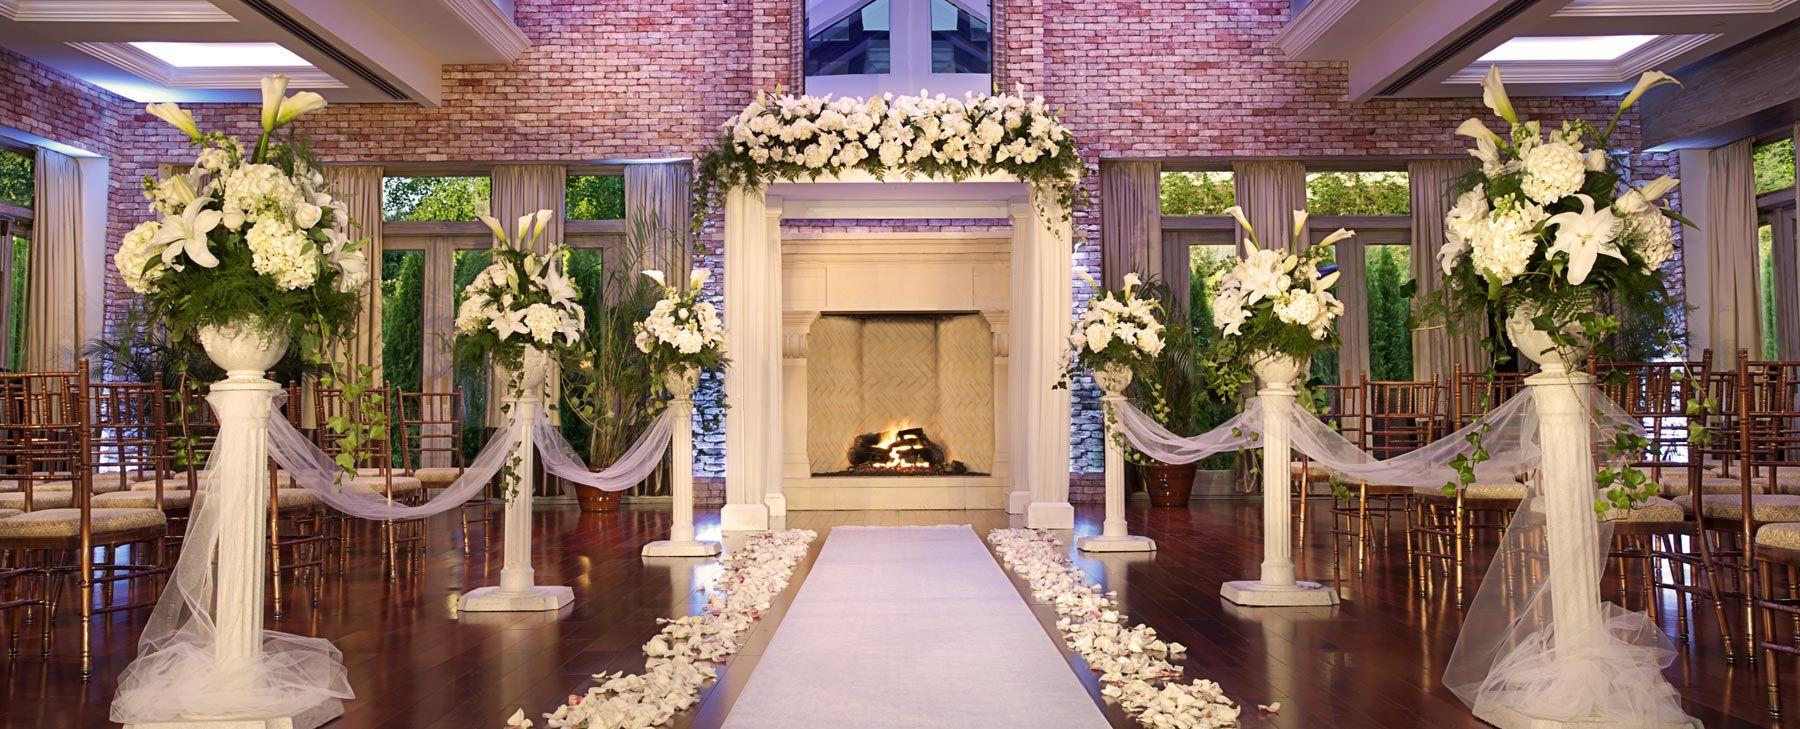 The Inn At Fox Hollow Gorgeous Wedding Spot On Long Island New York